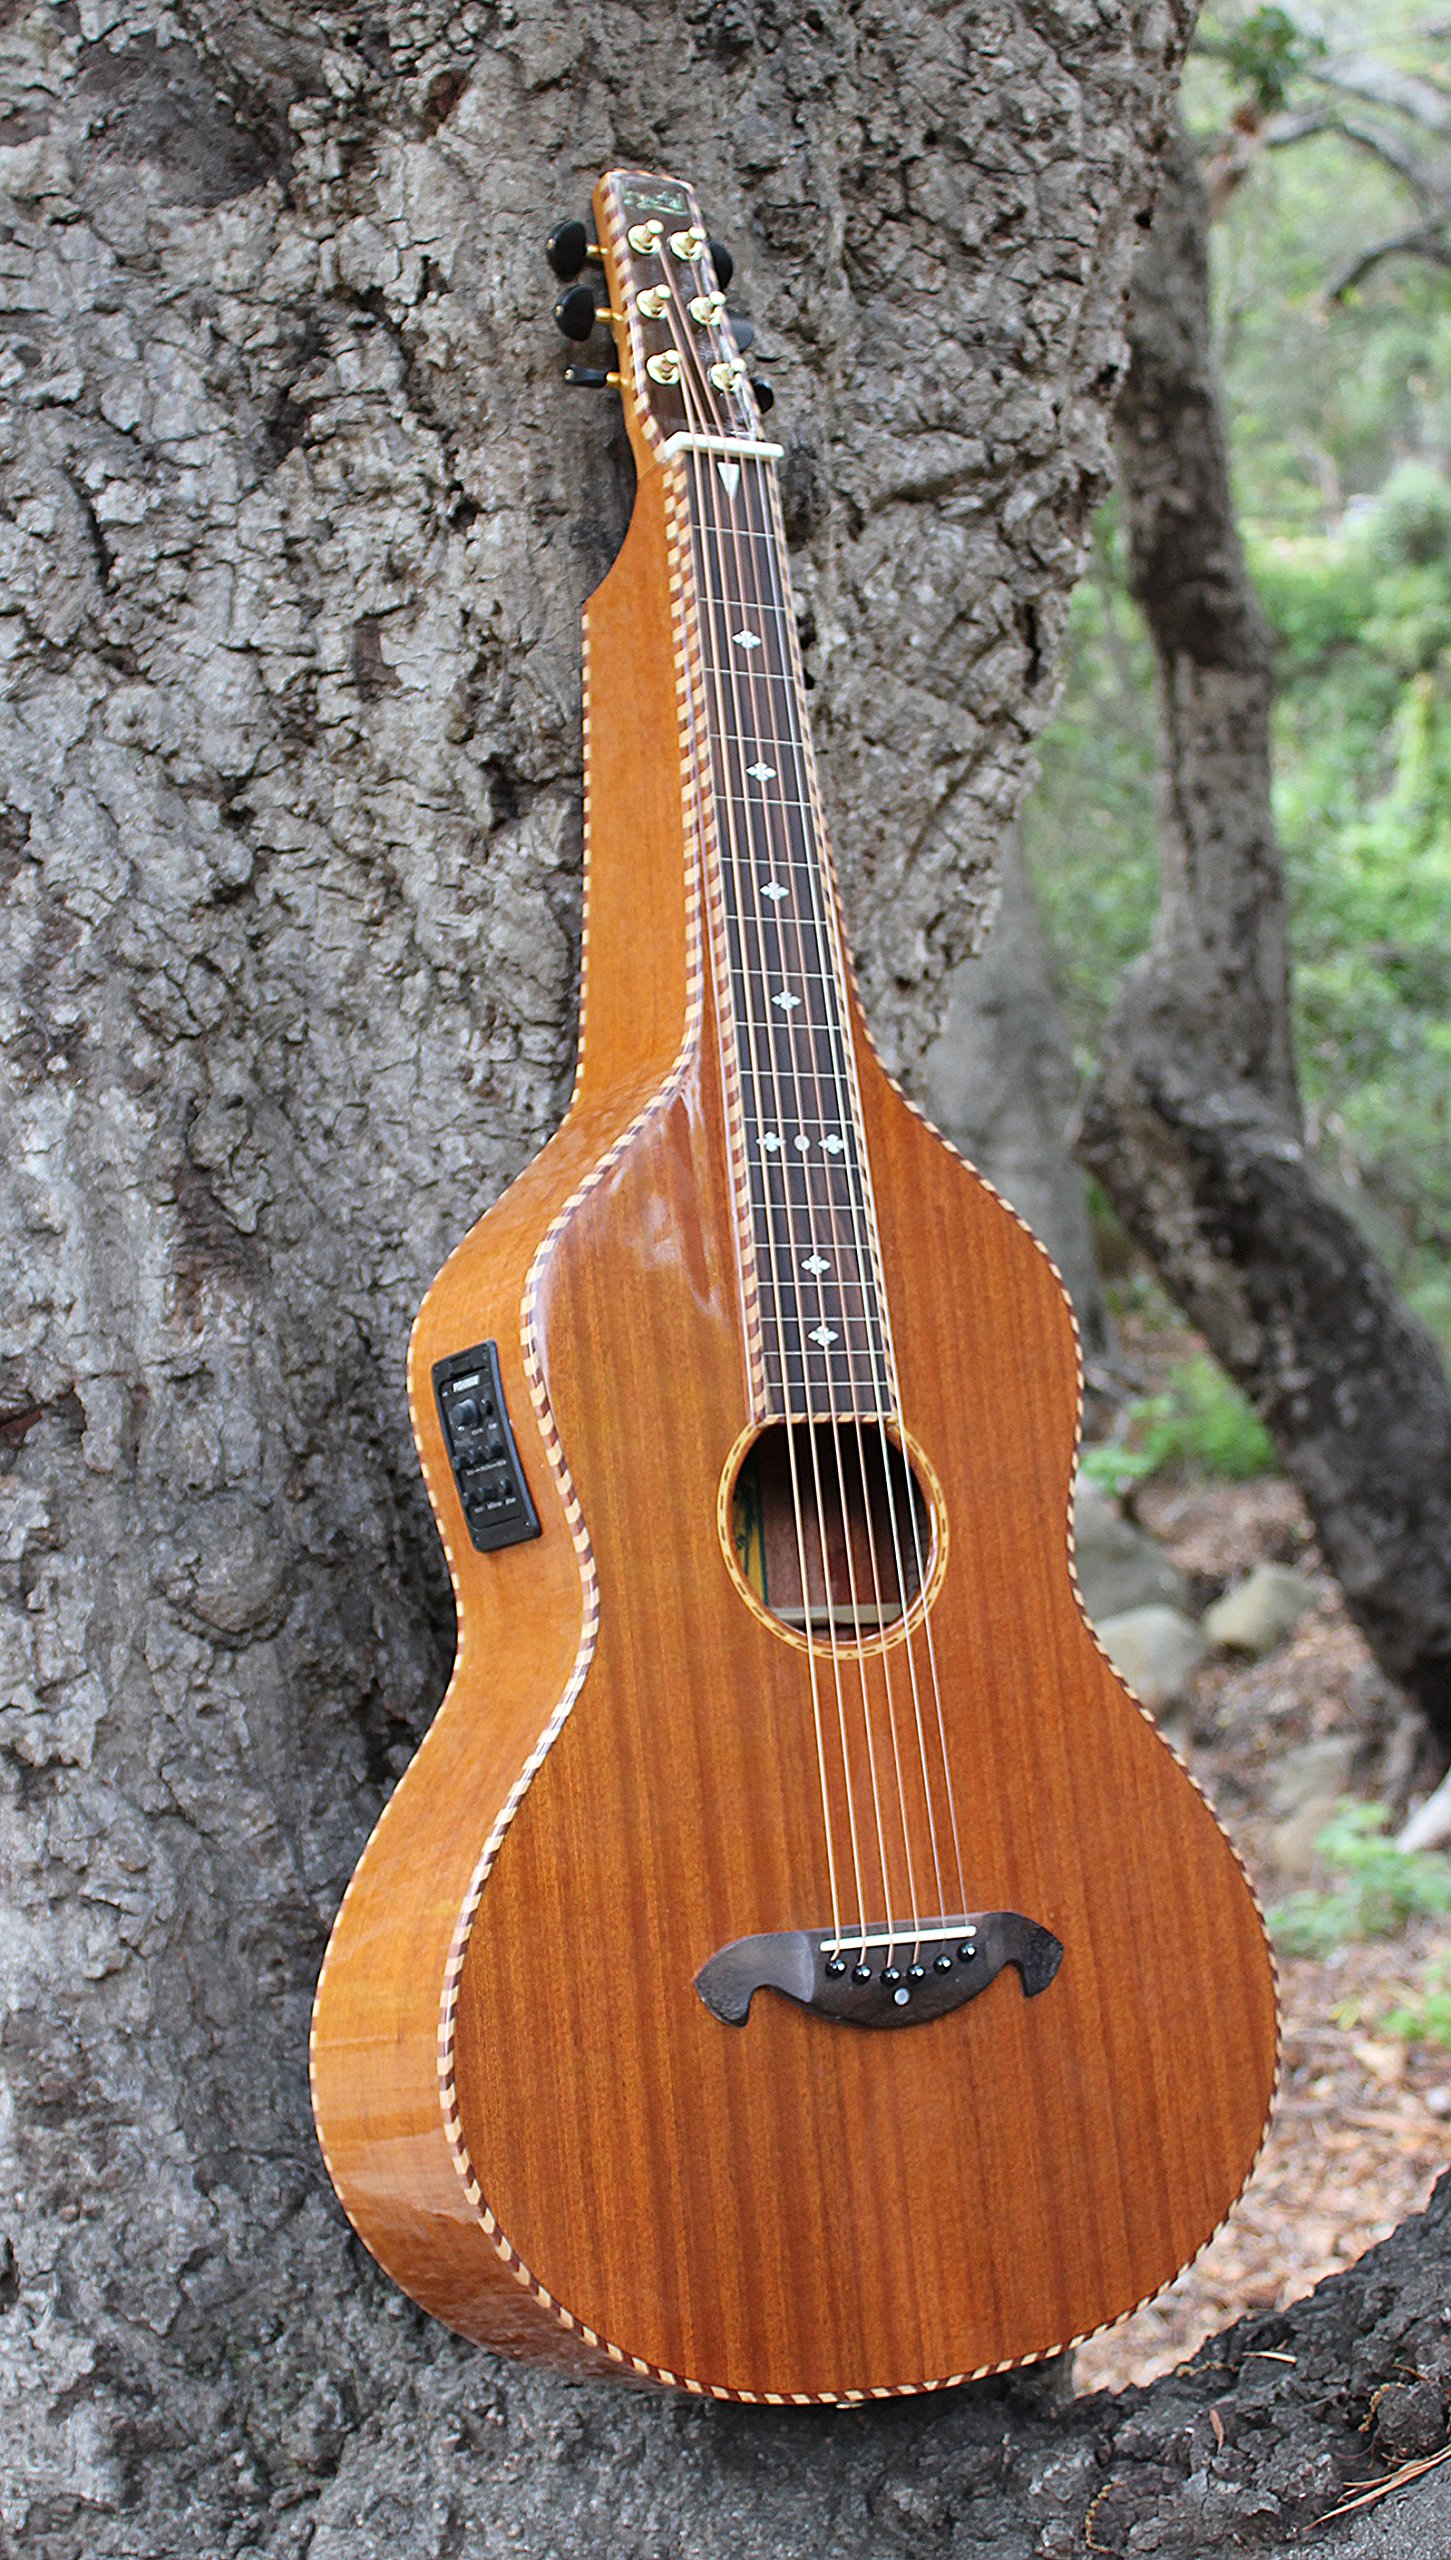 Imperial Royal Hawaiian Limited Edition Weissenborn Style Lap Steel Guitar